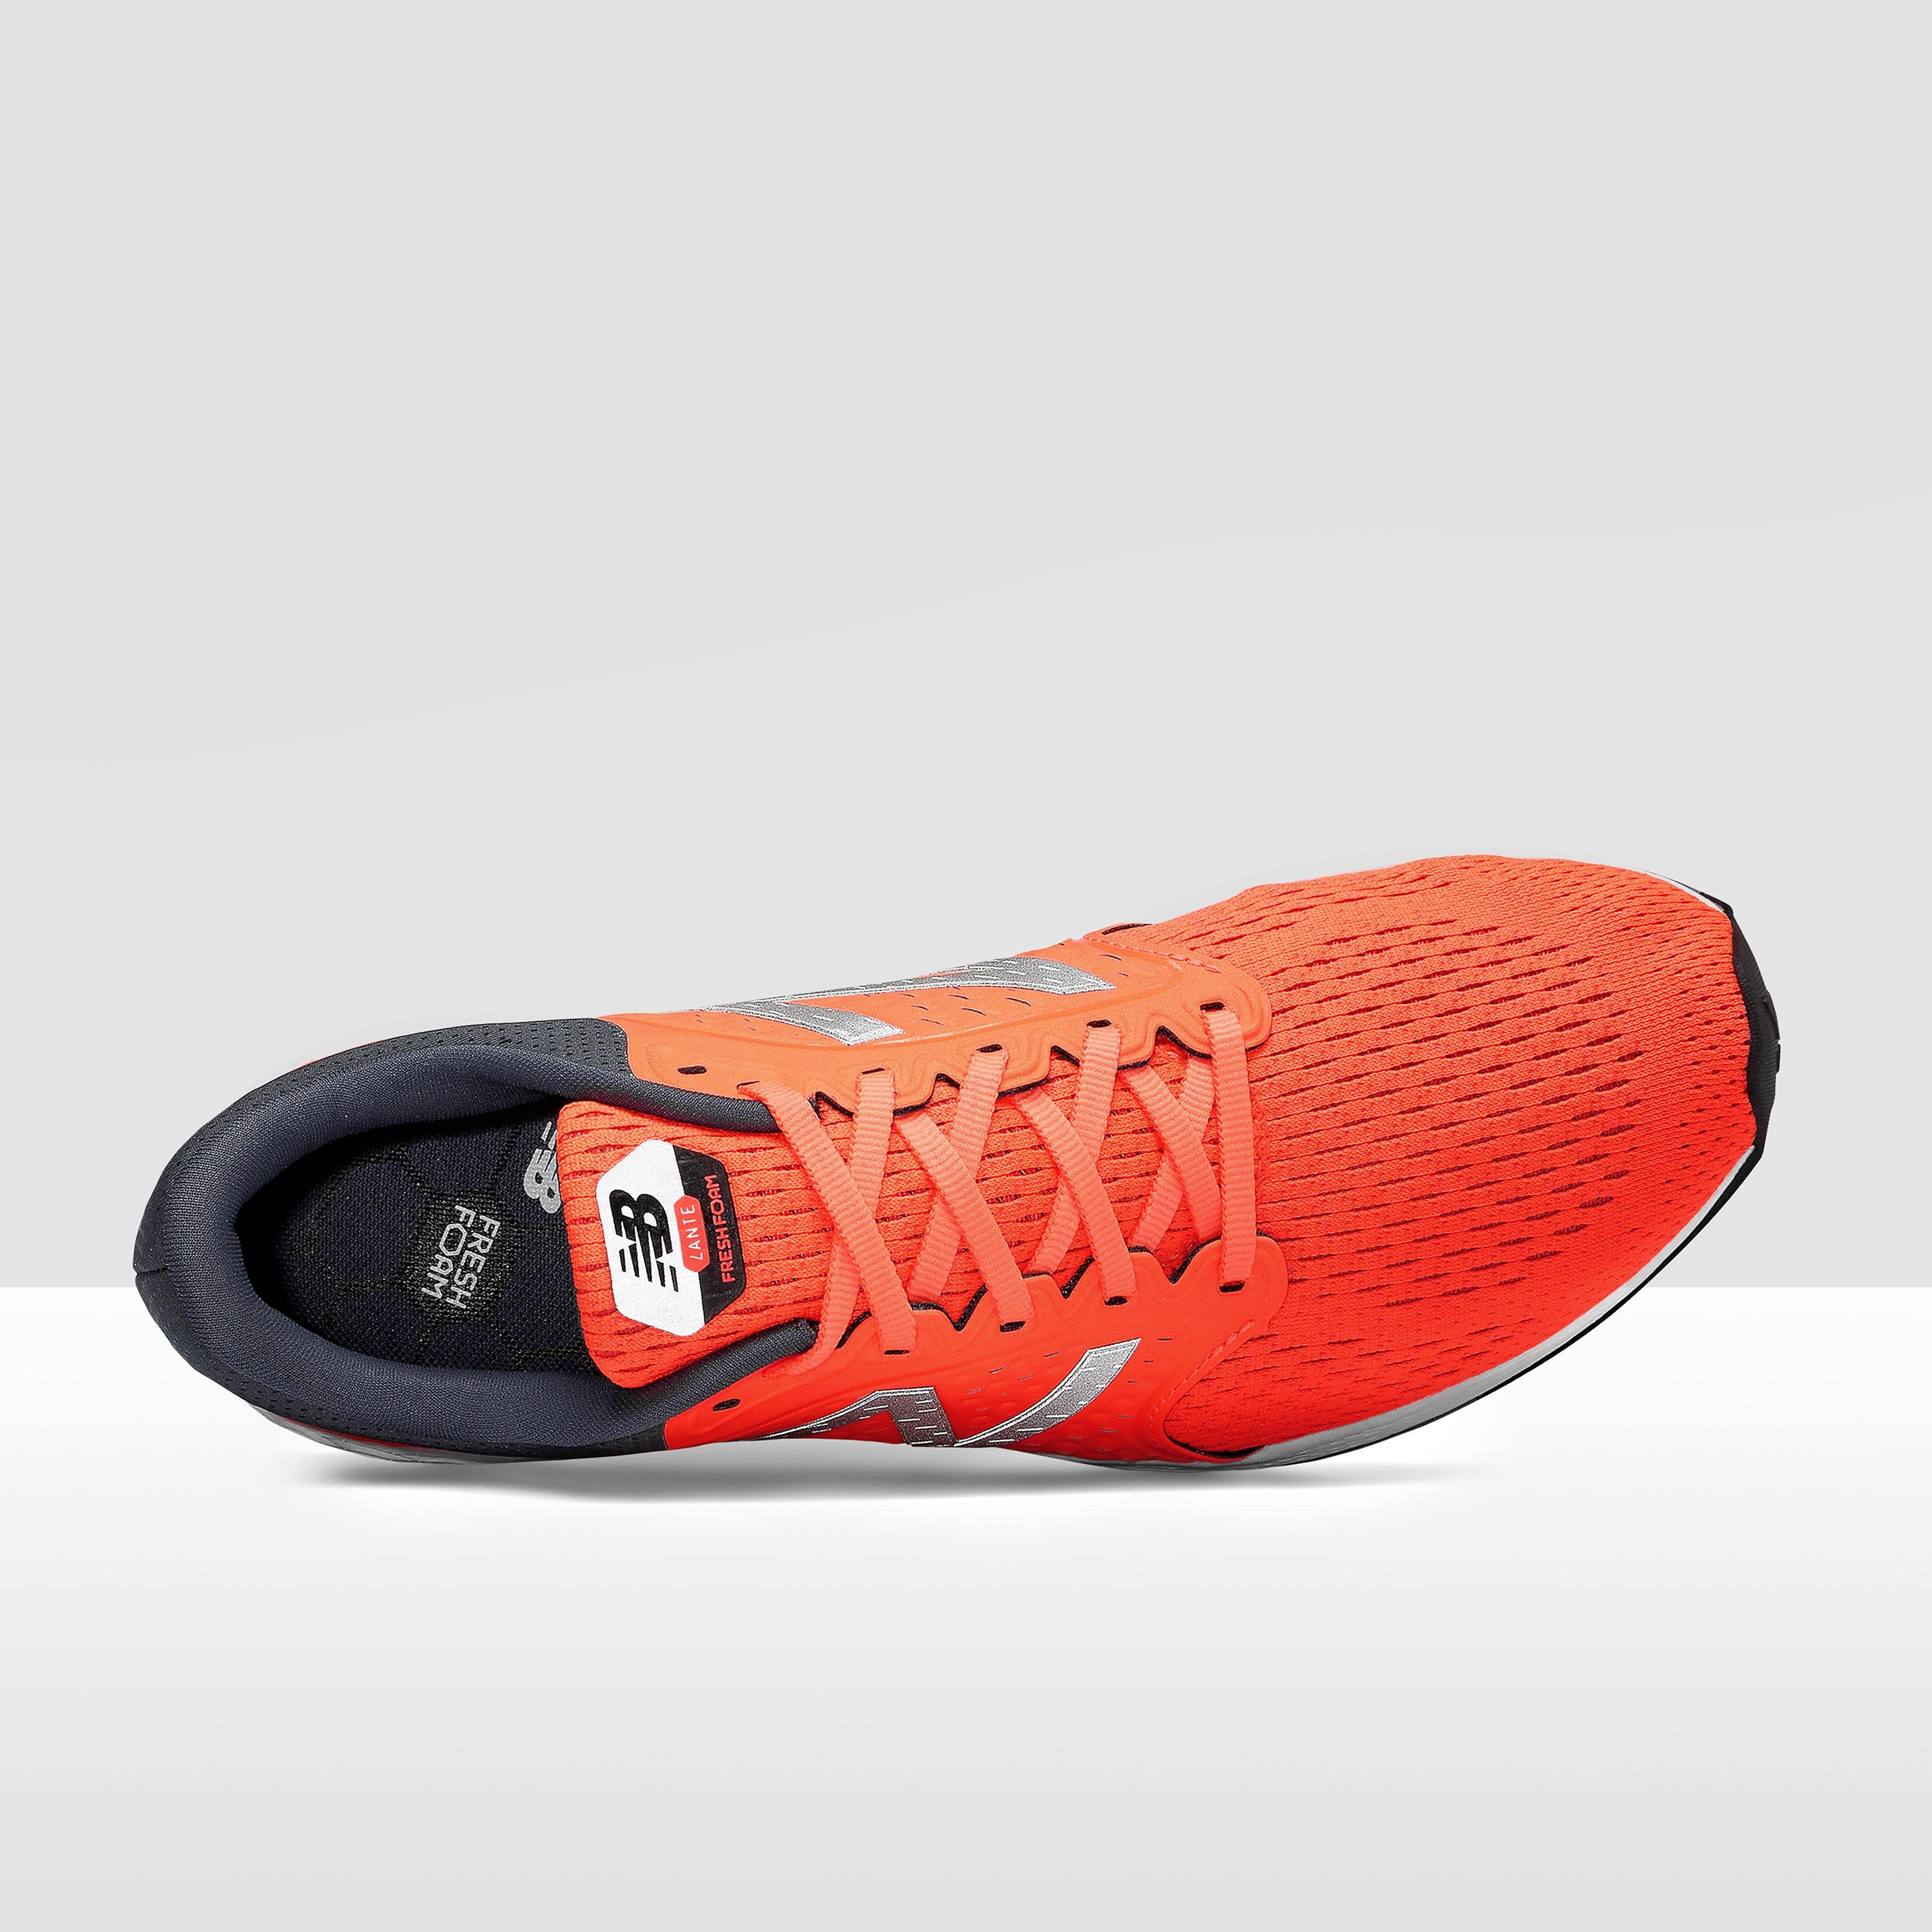 New Balance Fresh Foam Zante V4 Men's Running Shoes